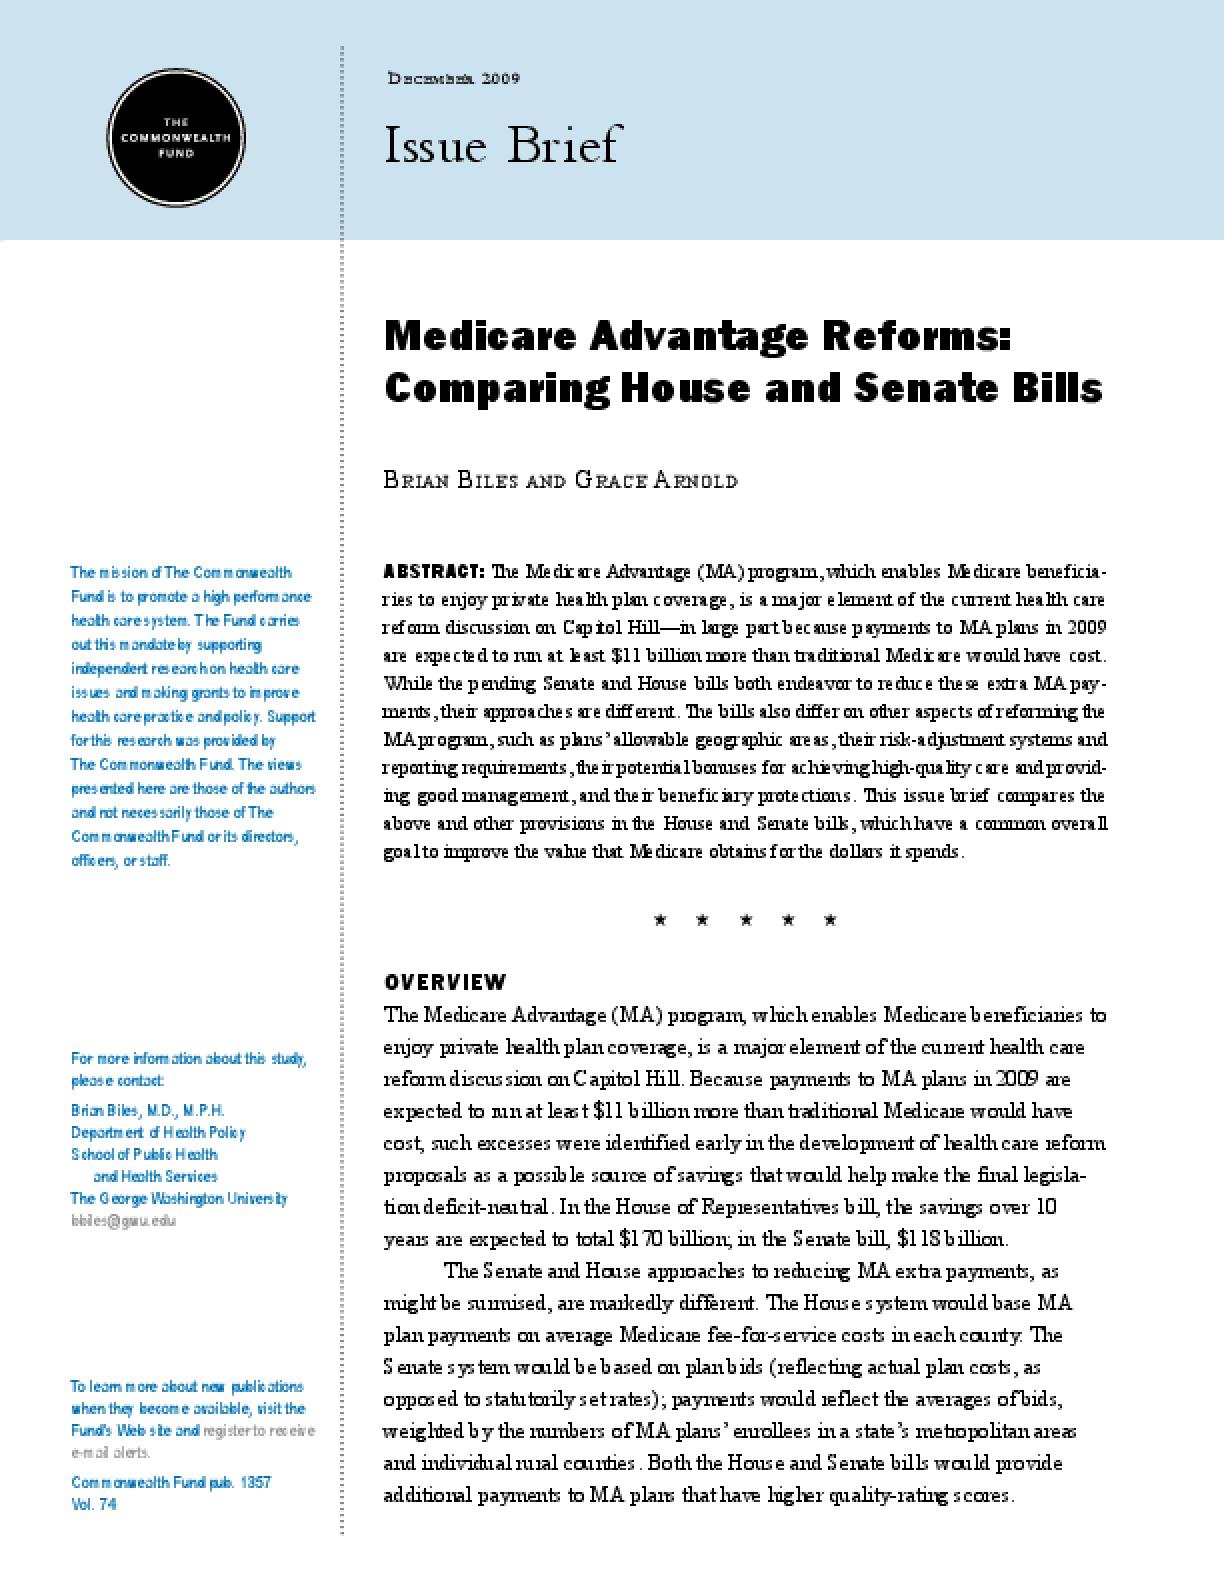 Medicare Advantage Reforms: Comparing House and Senate Bills